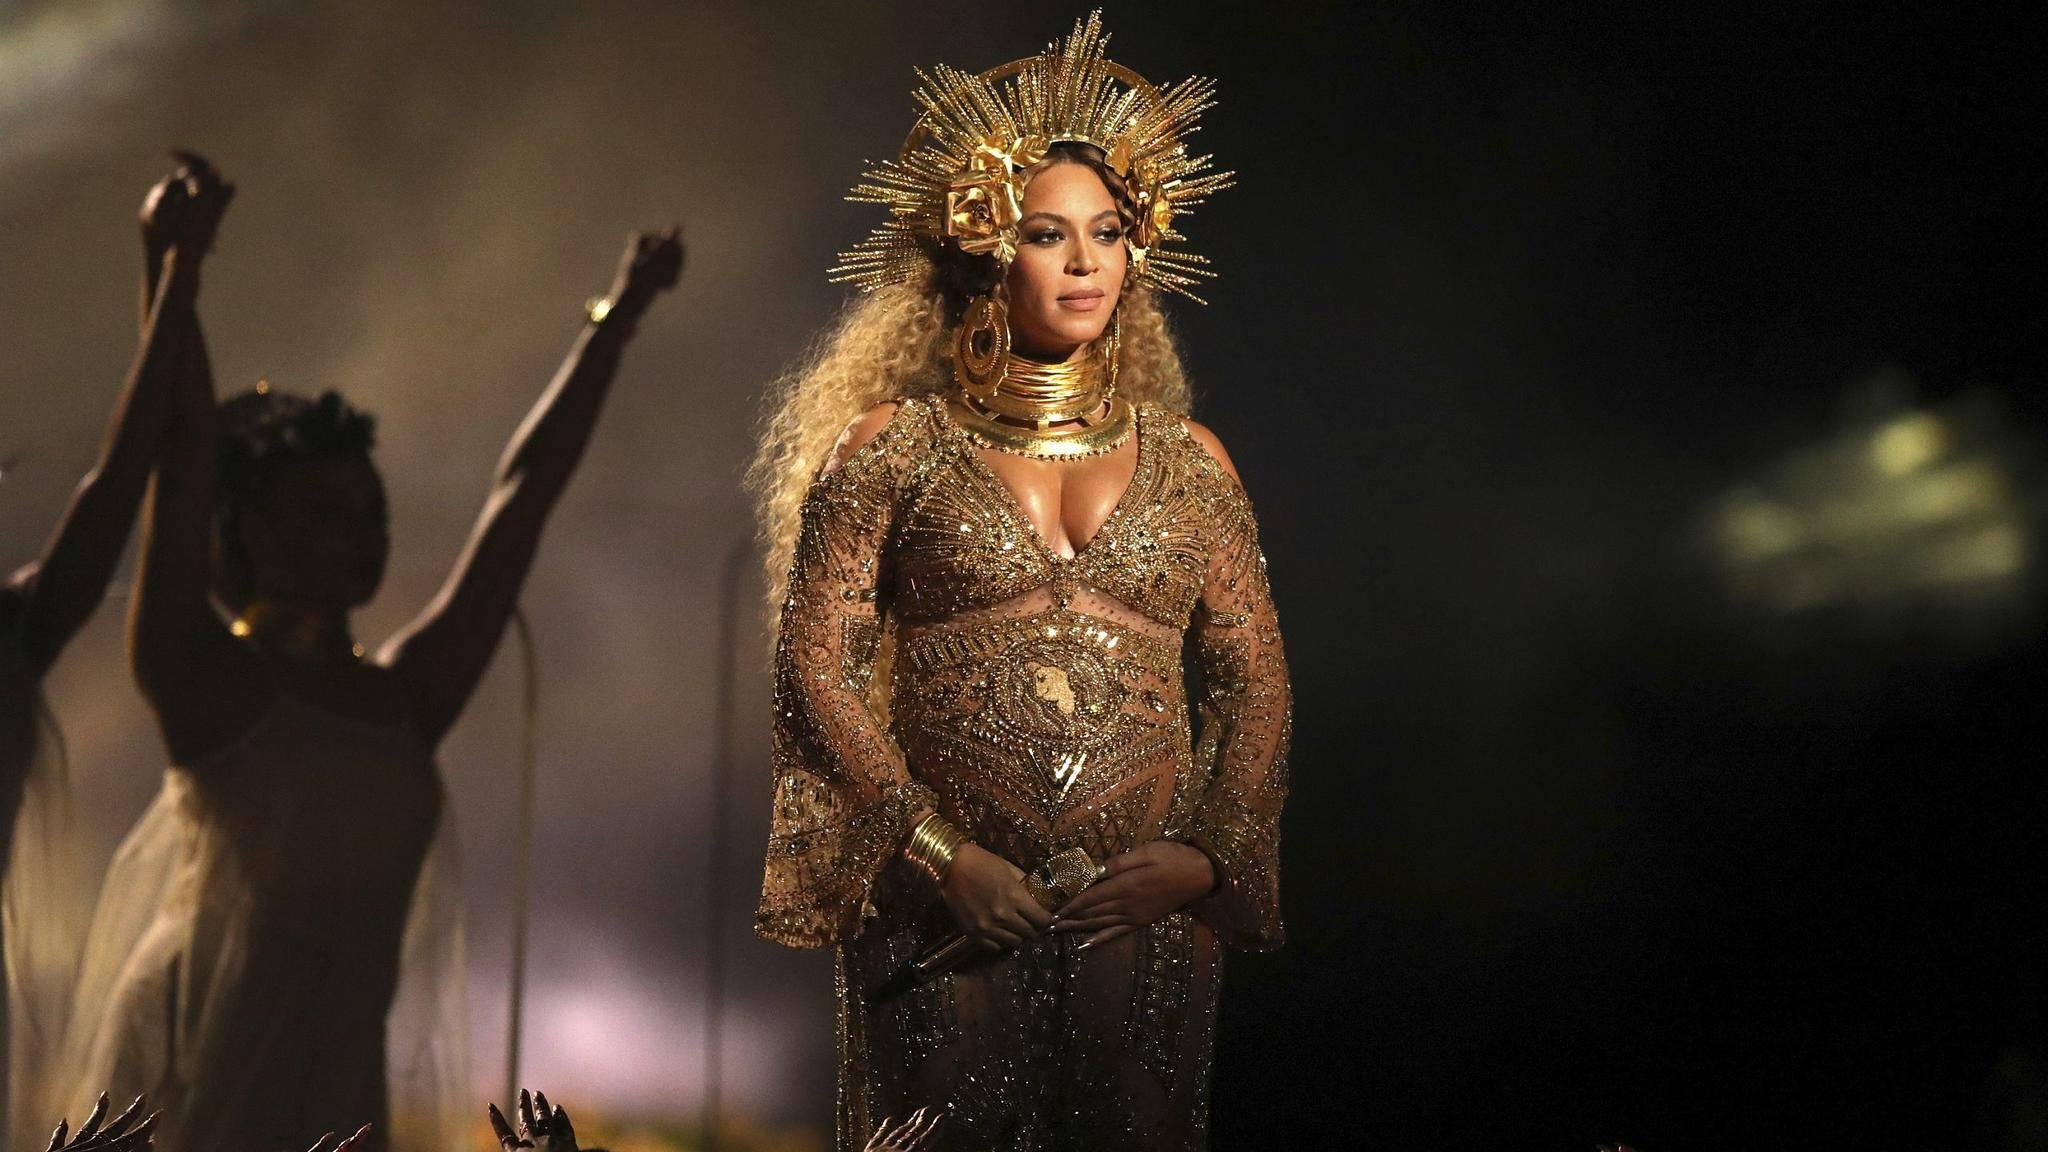 Beyoncé legte bei den Grammys 2017 einen spektakulären Auftritt hin.